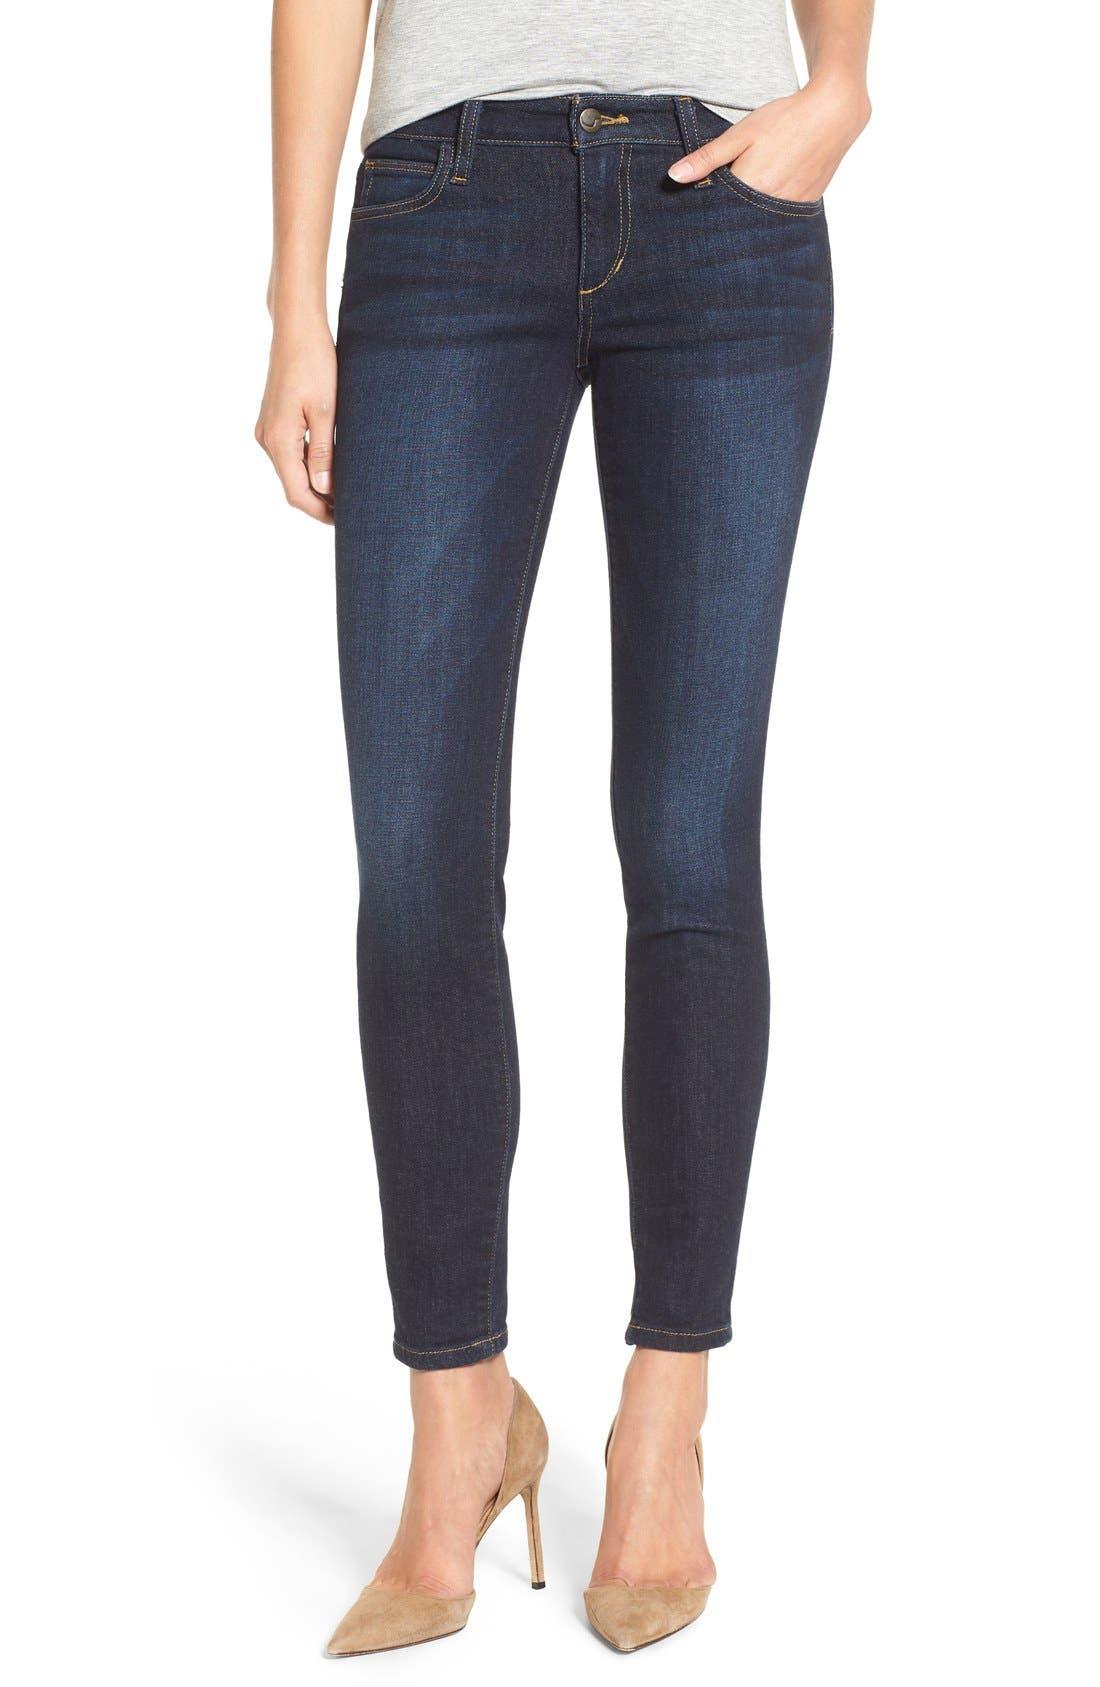 JOE'S Ankle Skinny Jeans, Main, color, 410